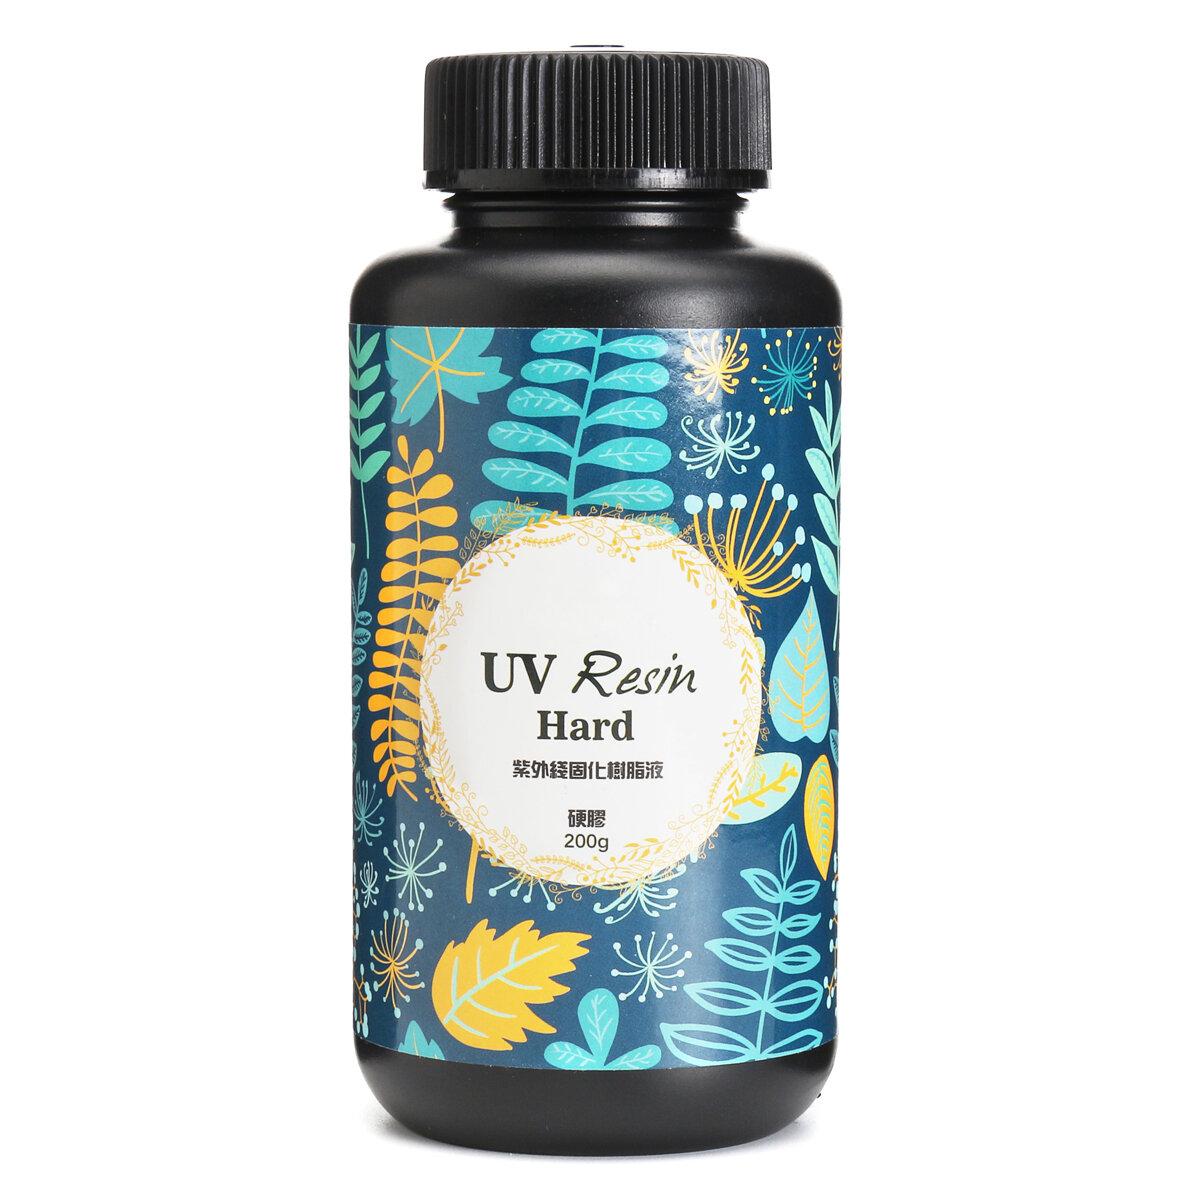 UV Resin Hard Ultraviolet Solar Sunlight Curing Cure Activated Crystal Glue 25/60/100/200g